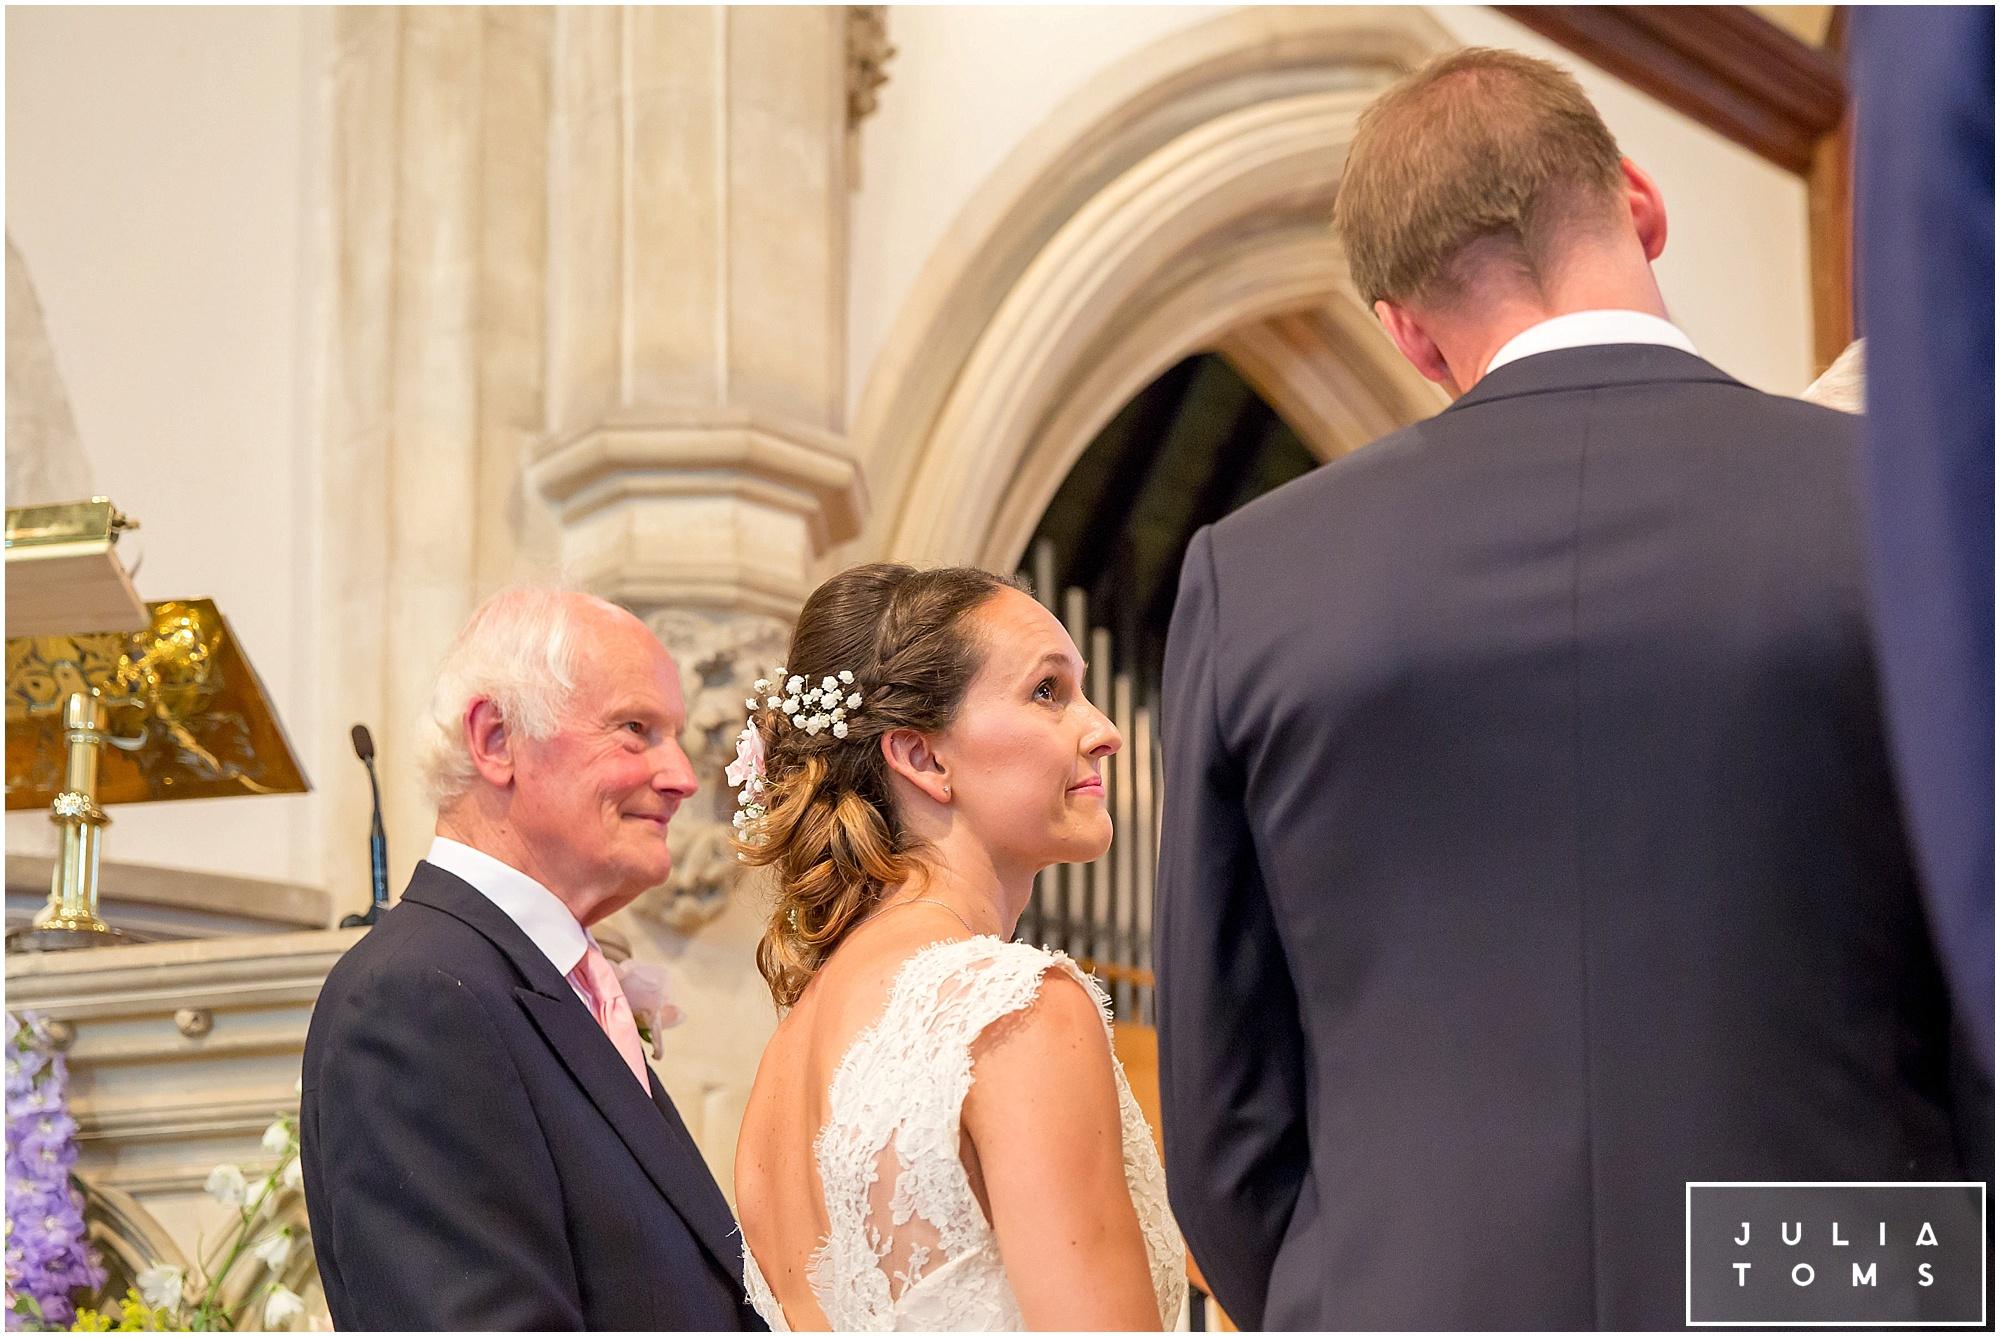 julia_toms_chichester_wedding_photographer_portsmouth_023.jpg